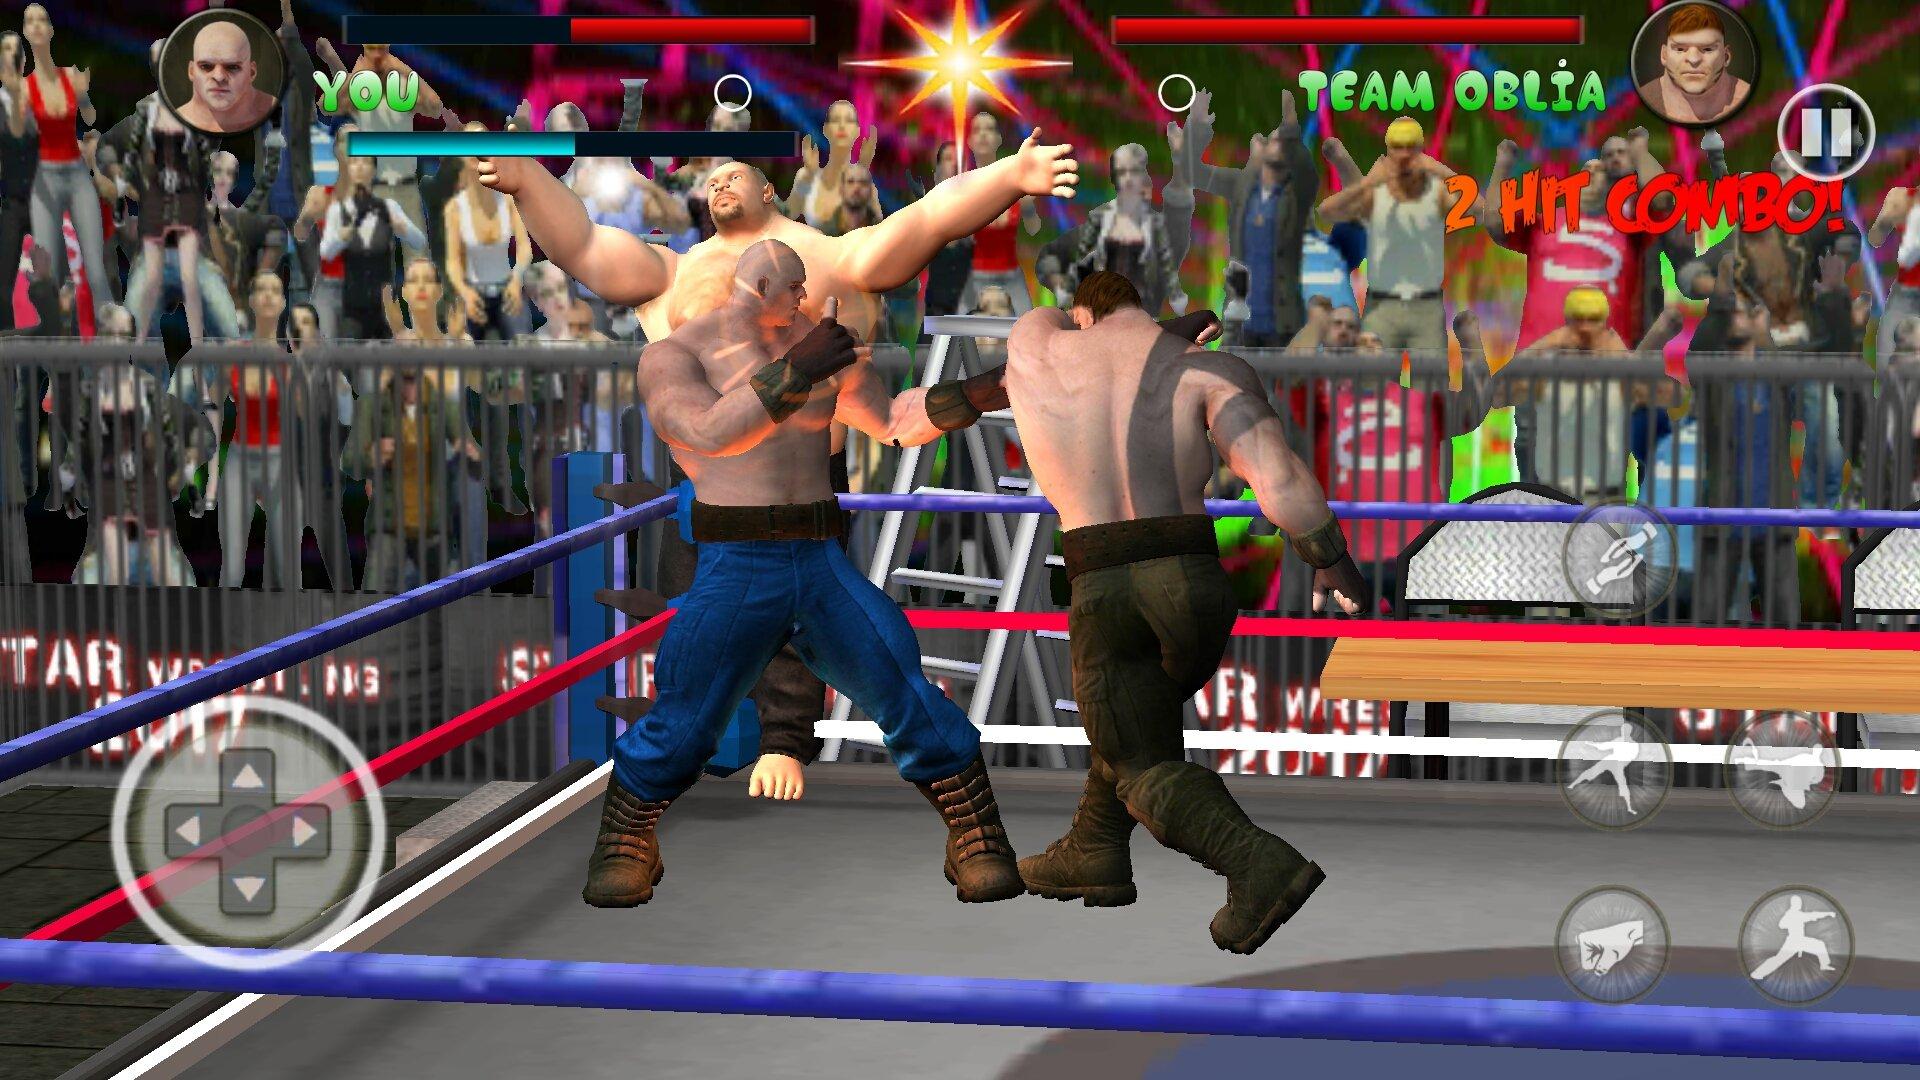 Wrestling Revolution D Exhibition Title Match : World tag team wrestling revolution championship android